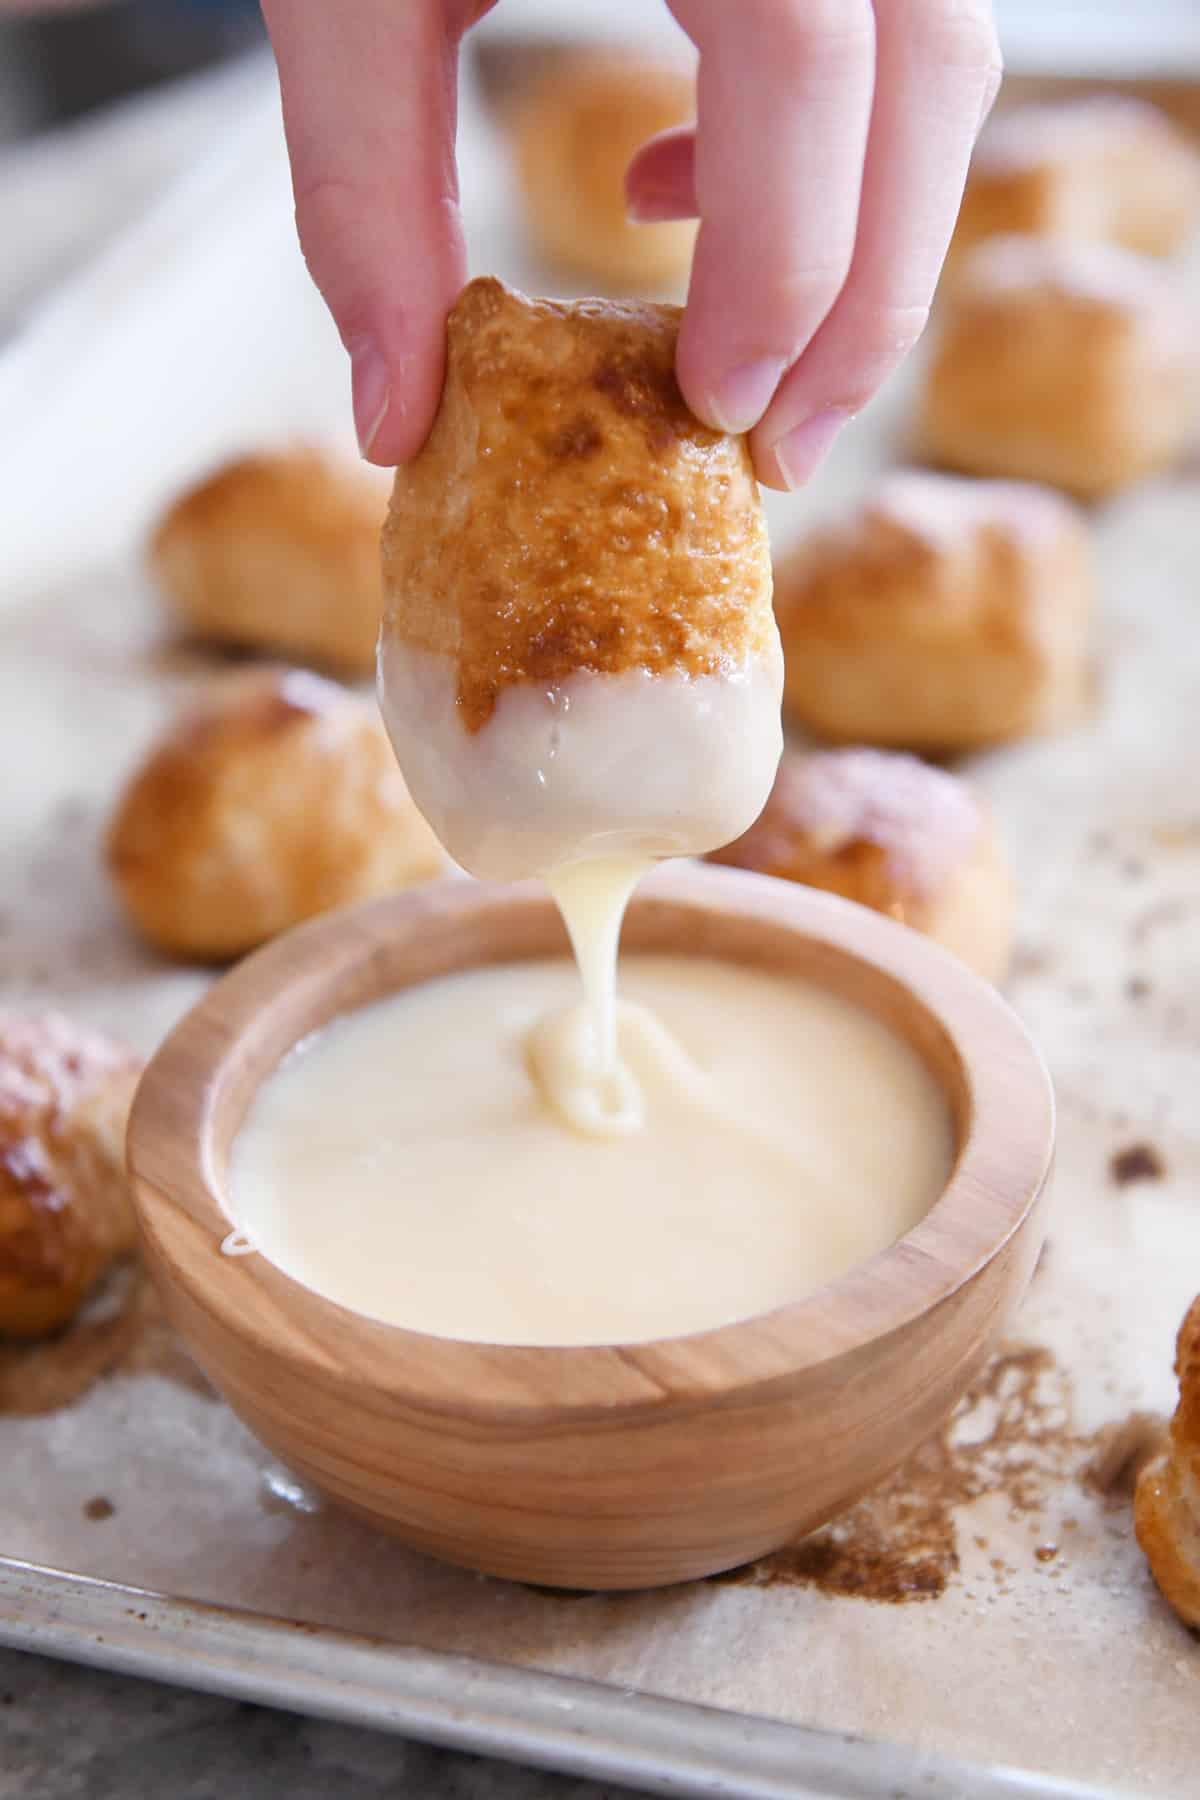 dipping easy homemade soft pretzel bites in homemade cheese sauce